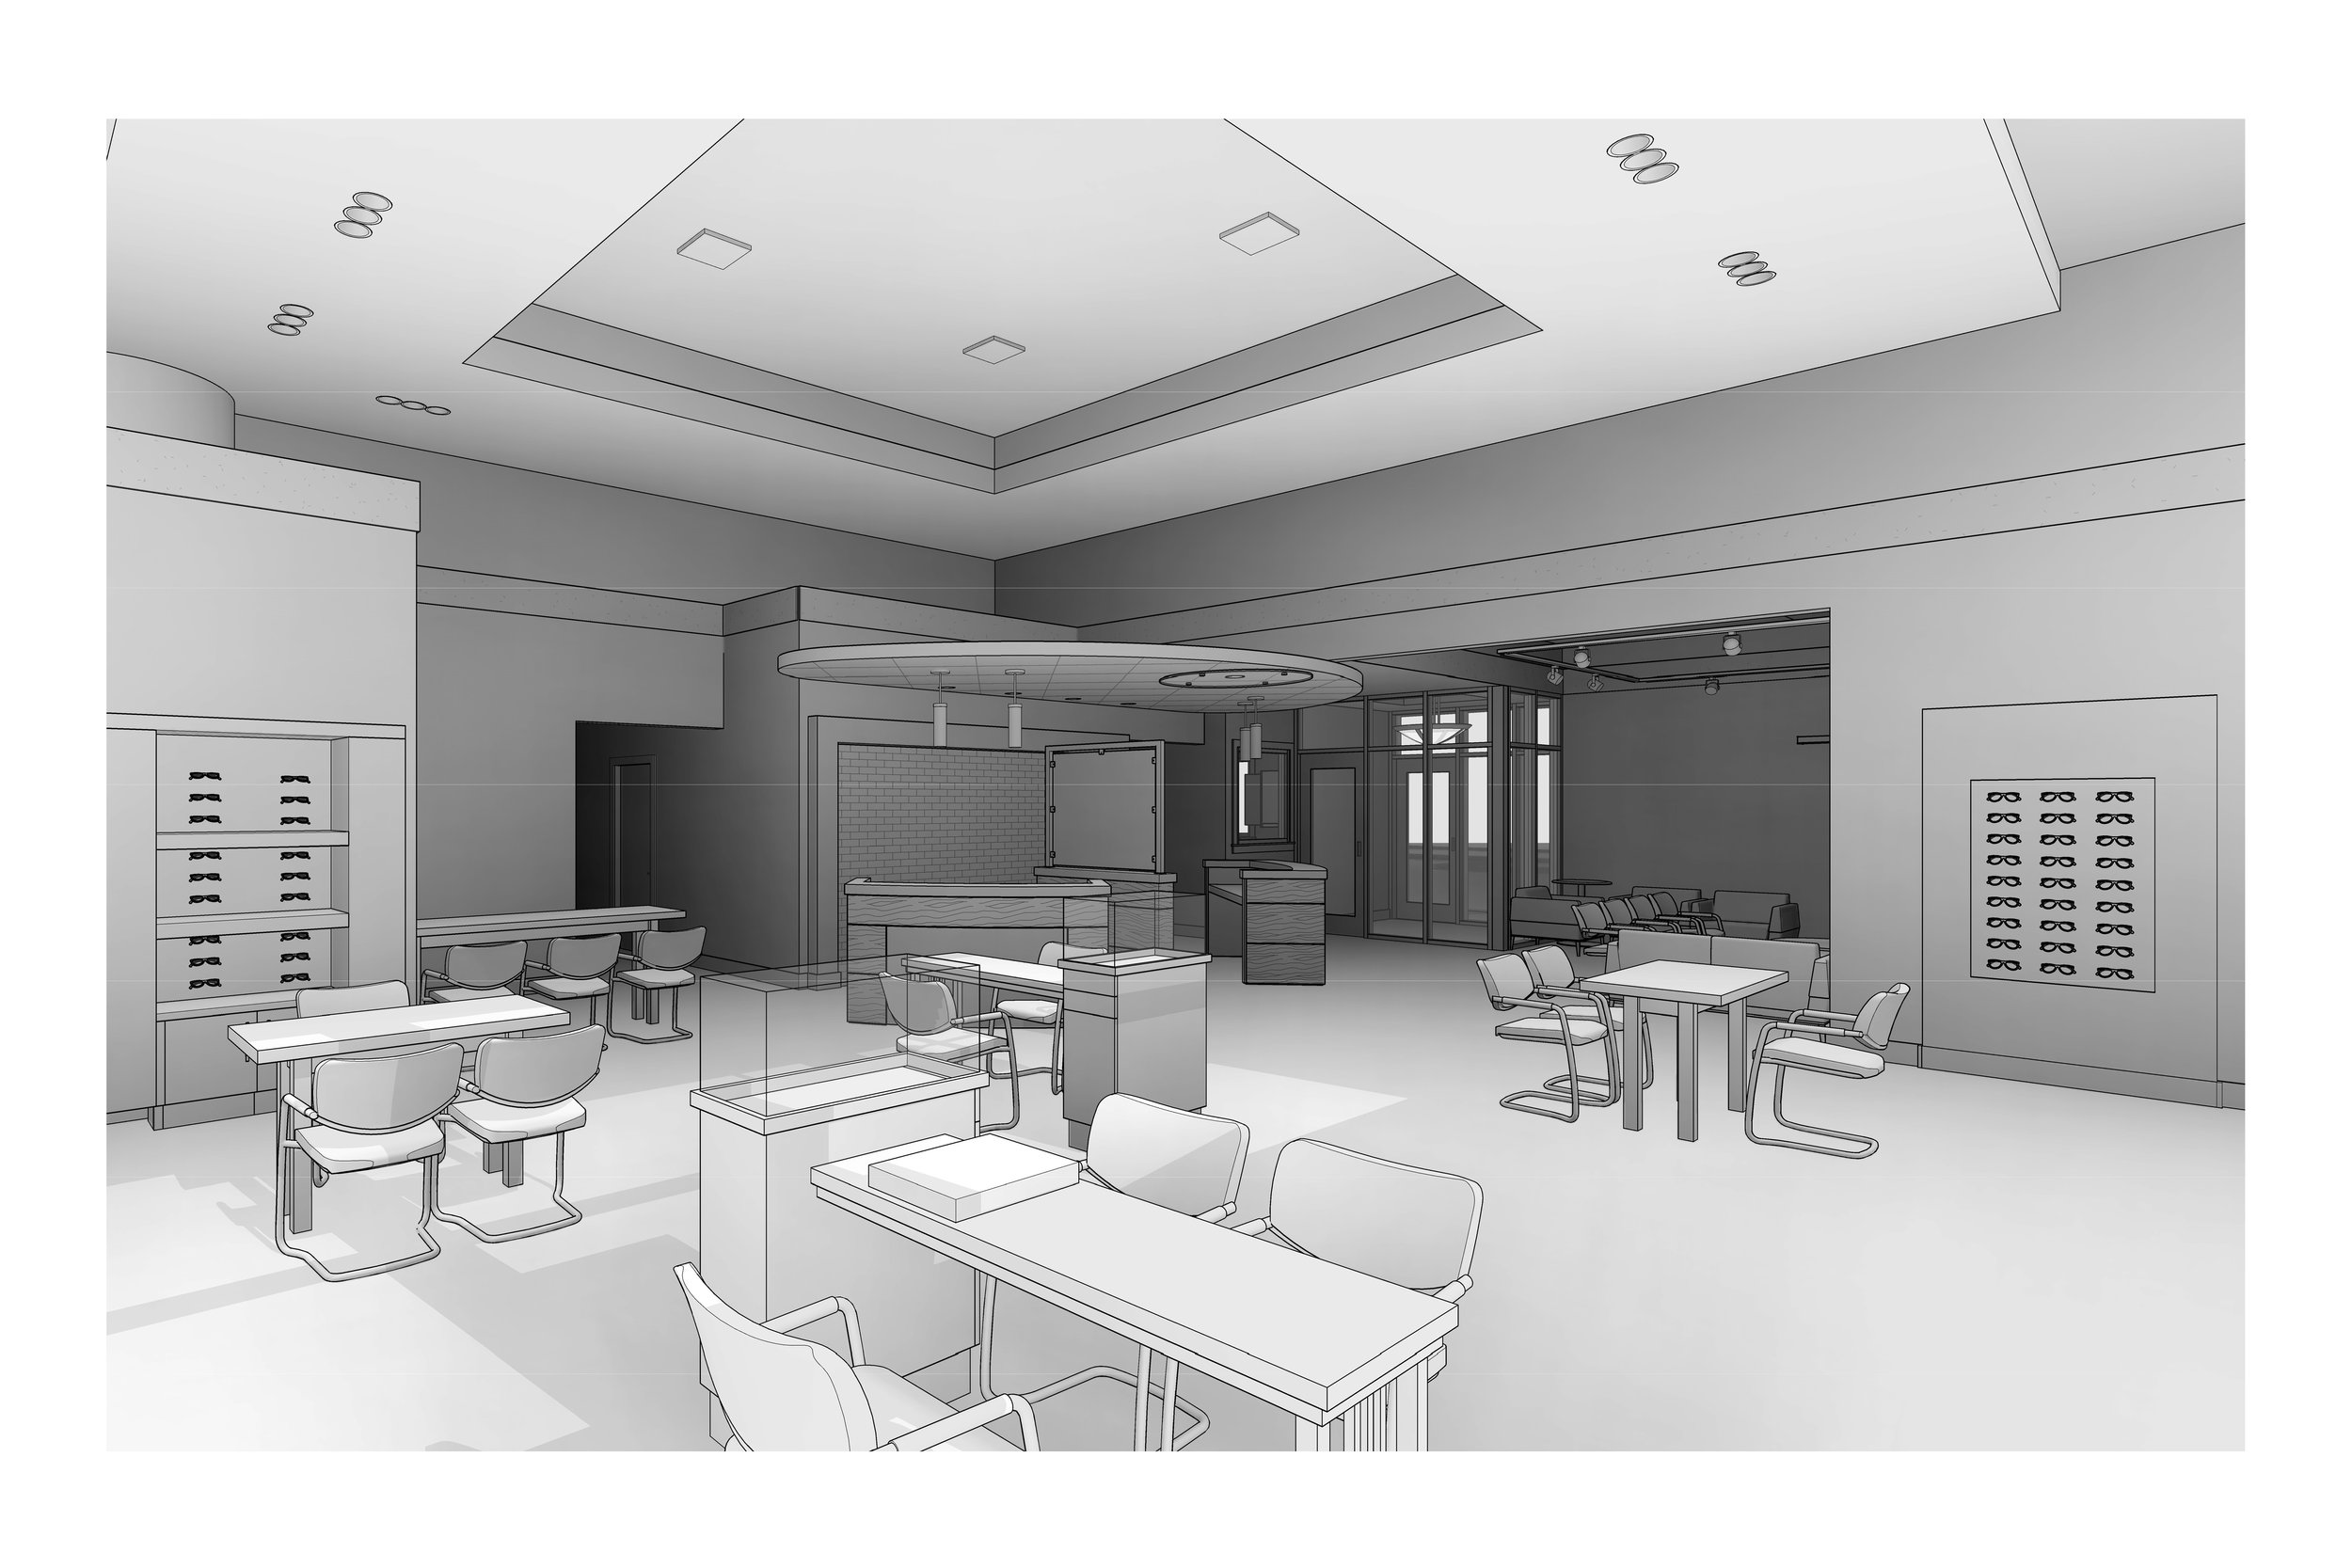 SEABERT_interior render 03reduced.jpg